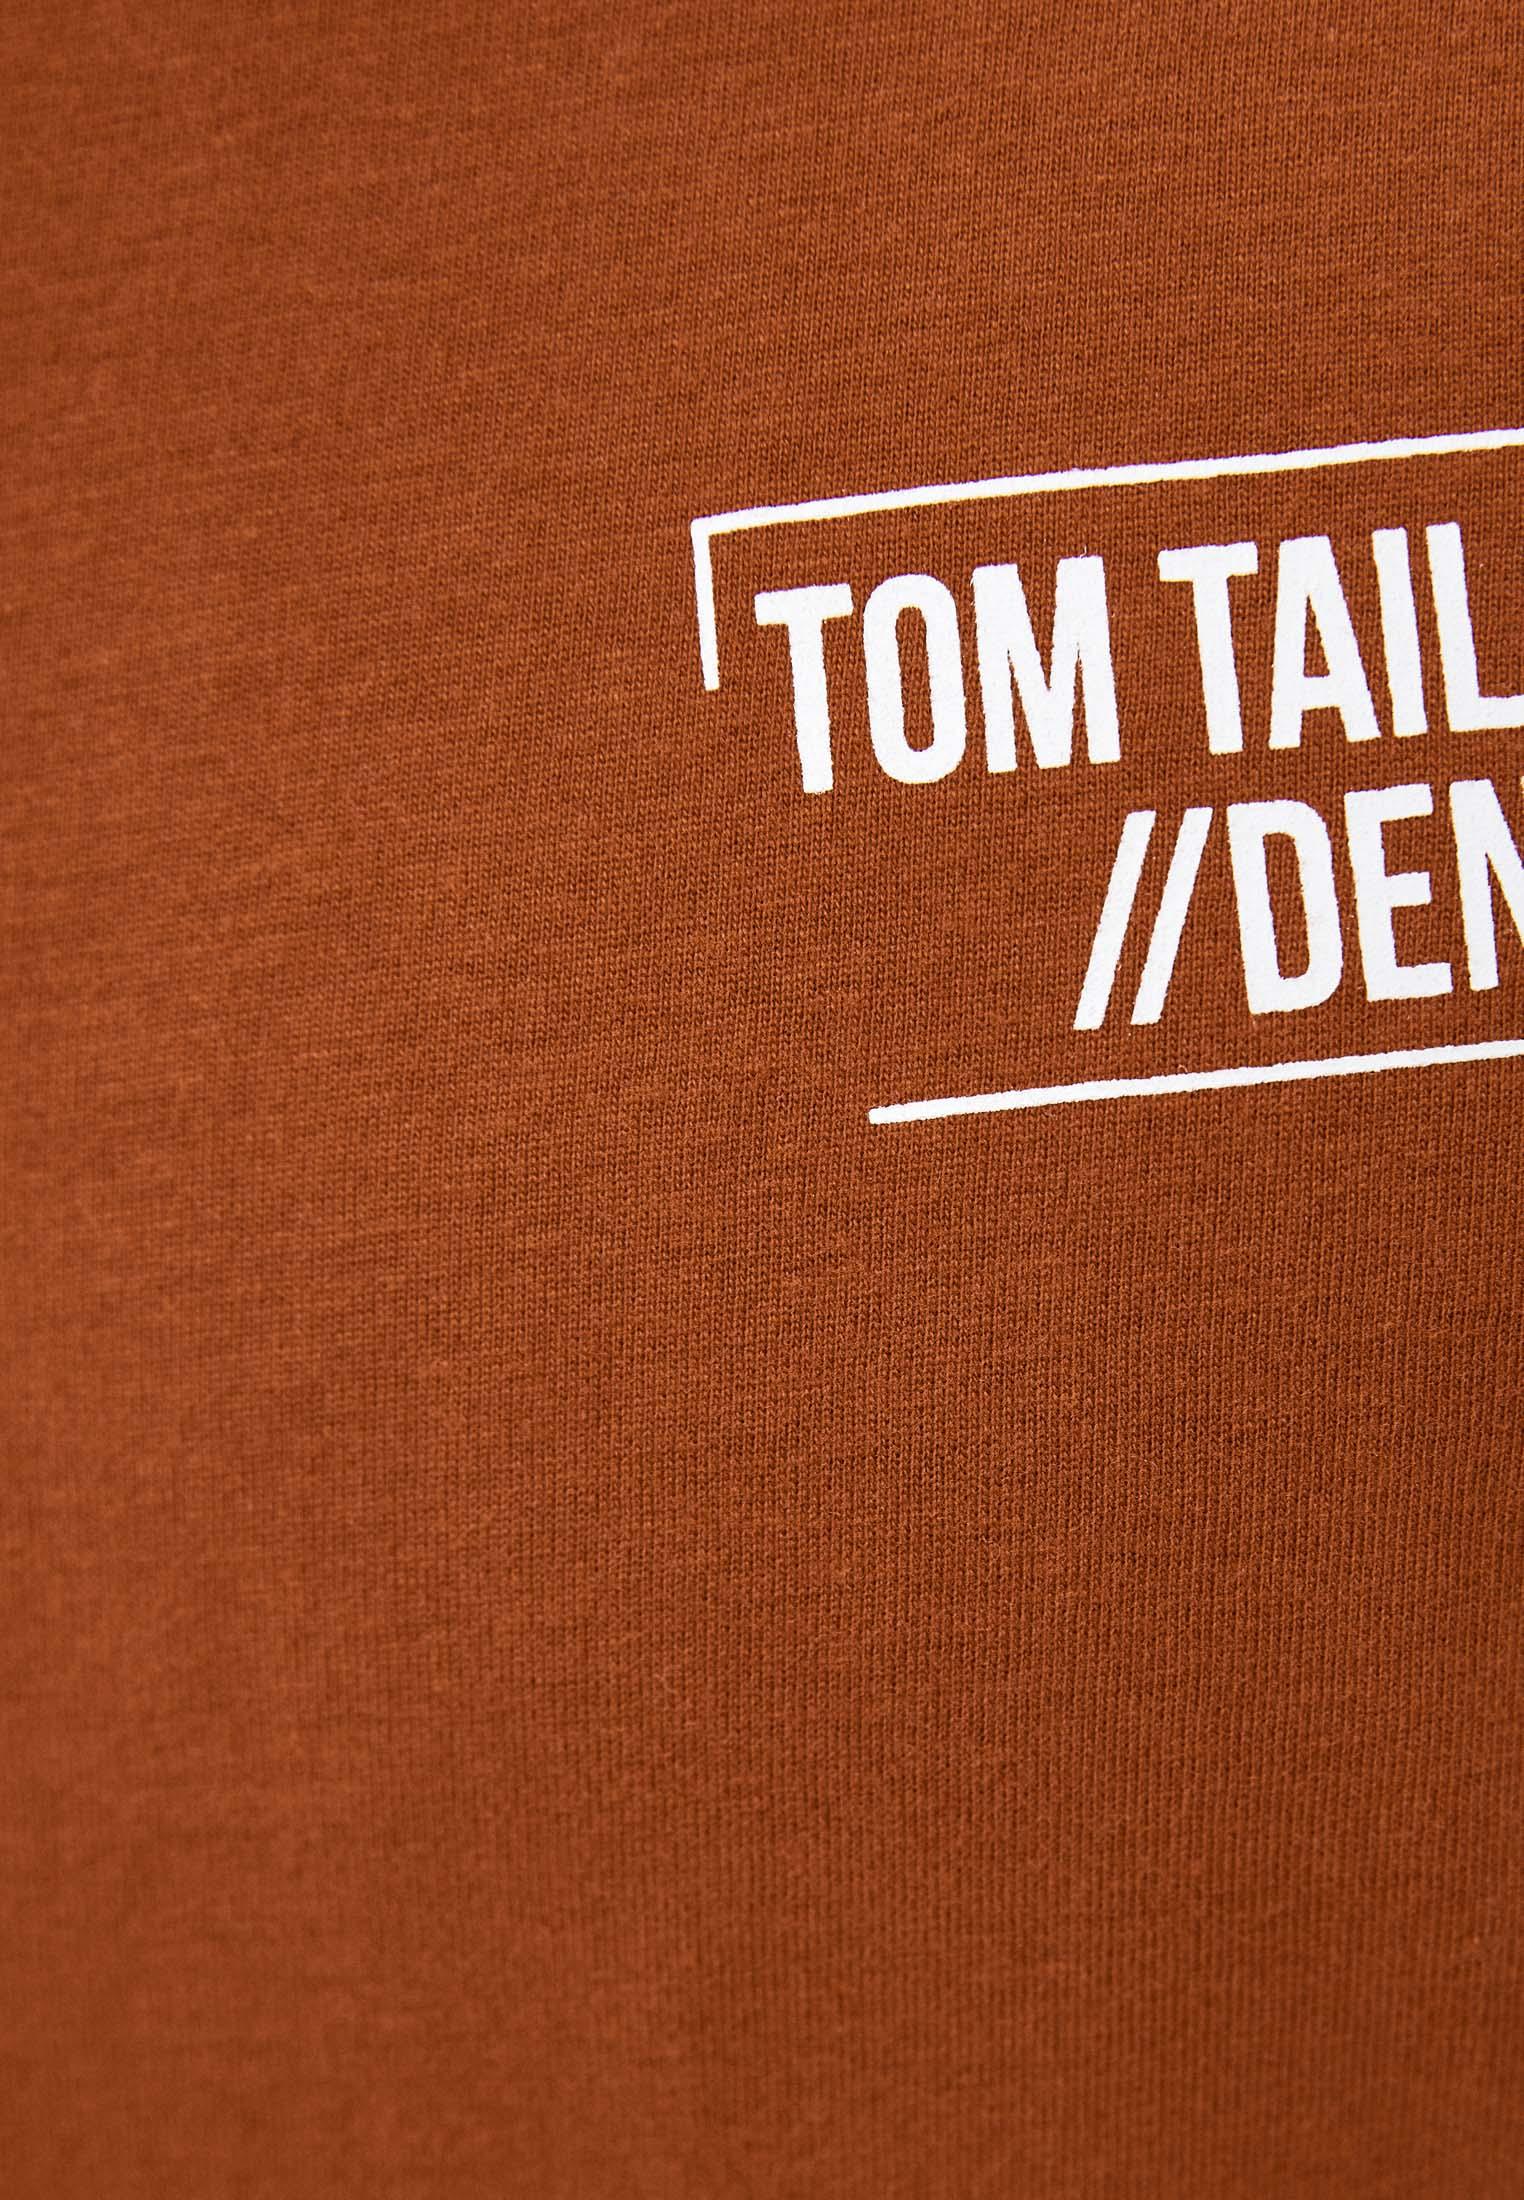 Футболка с коротким рукавом Tom Tailor Denim 1021278: изображение 3